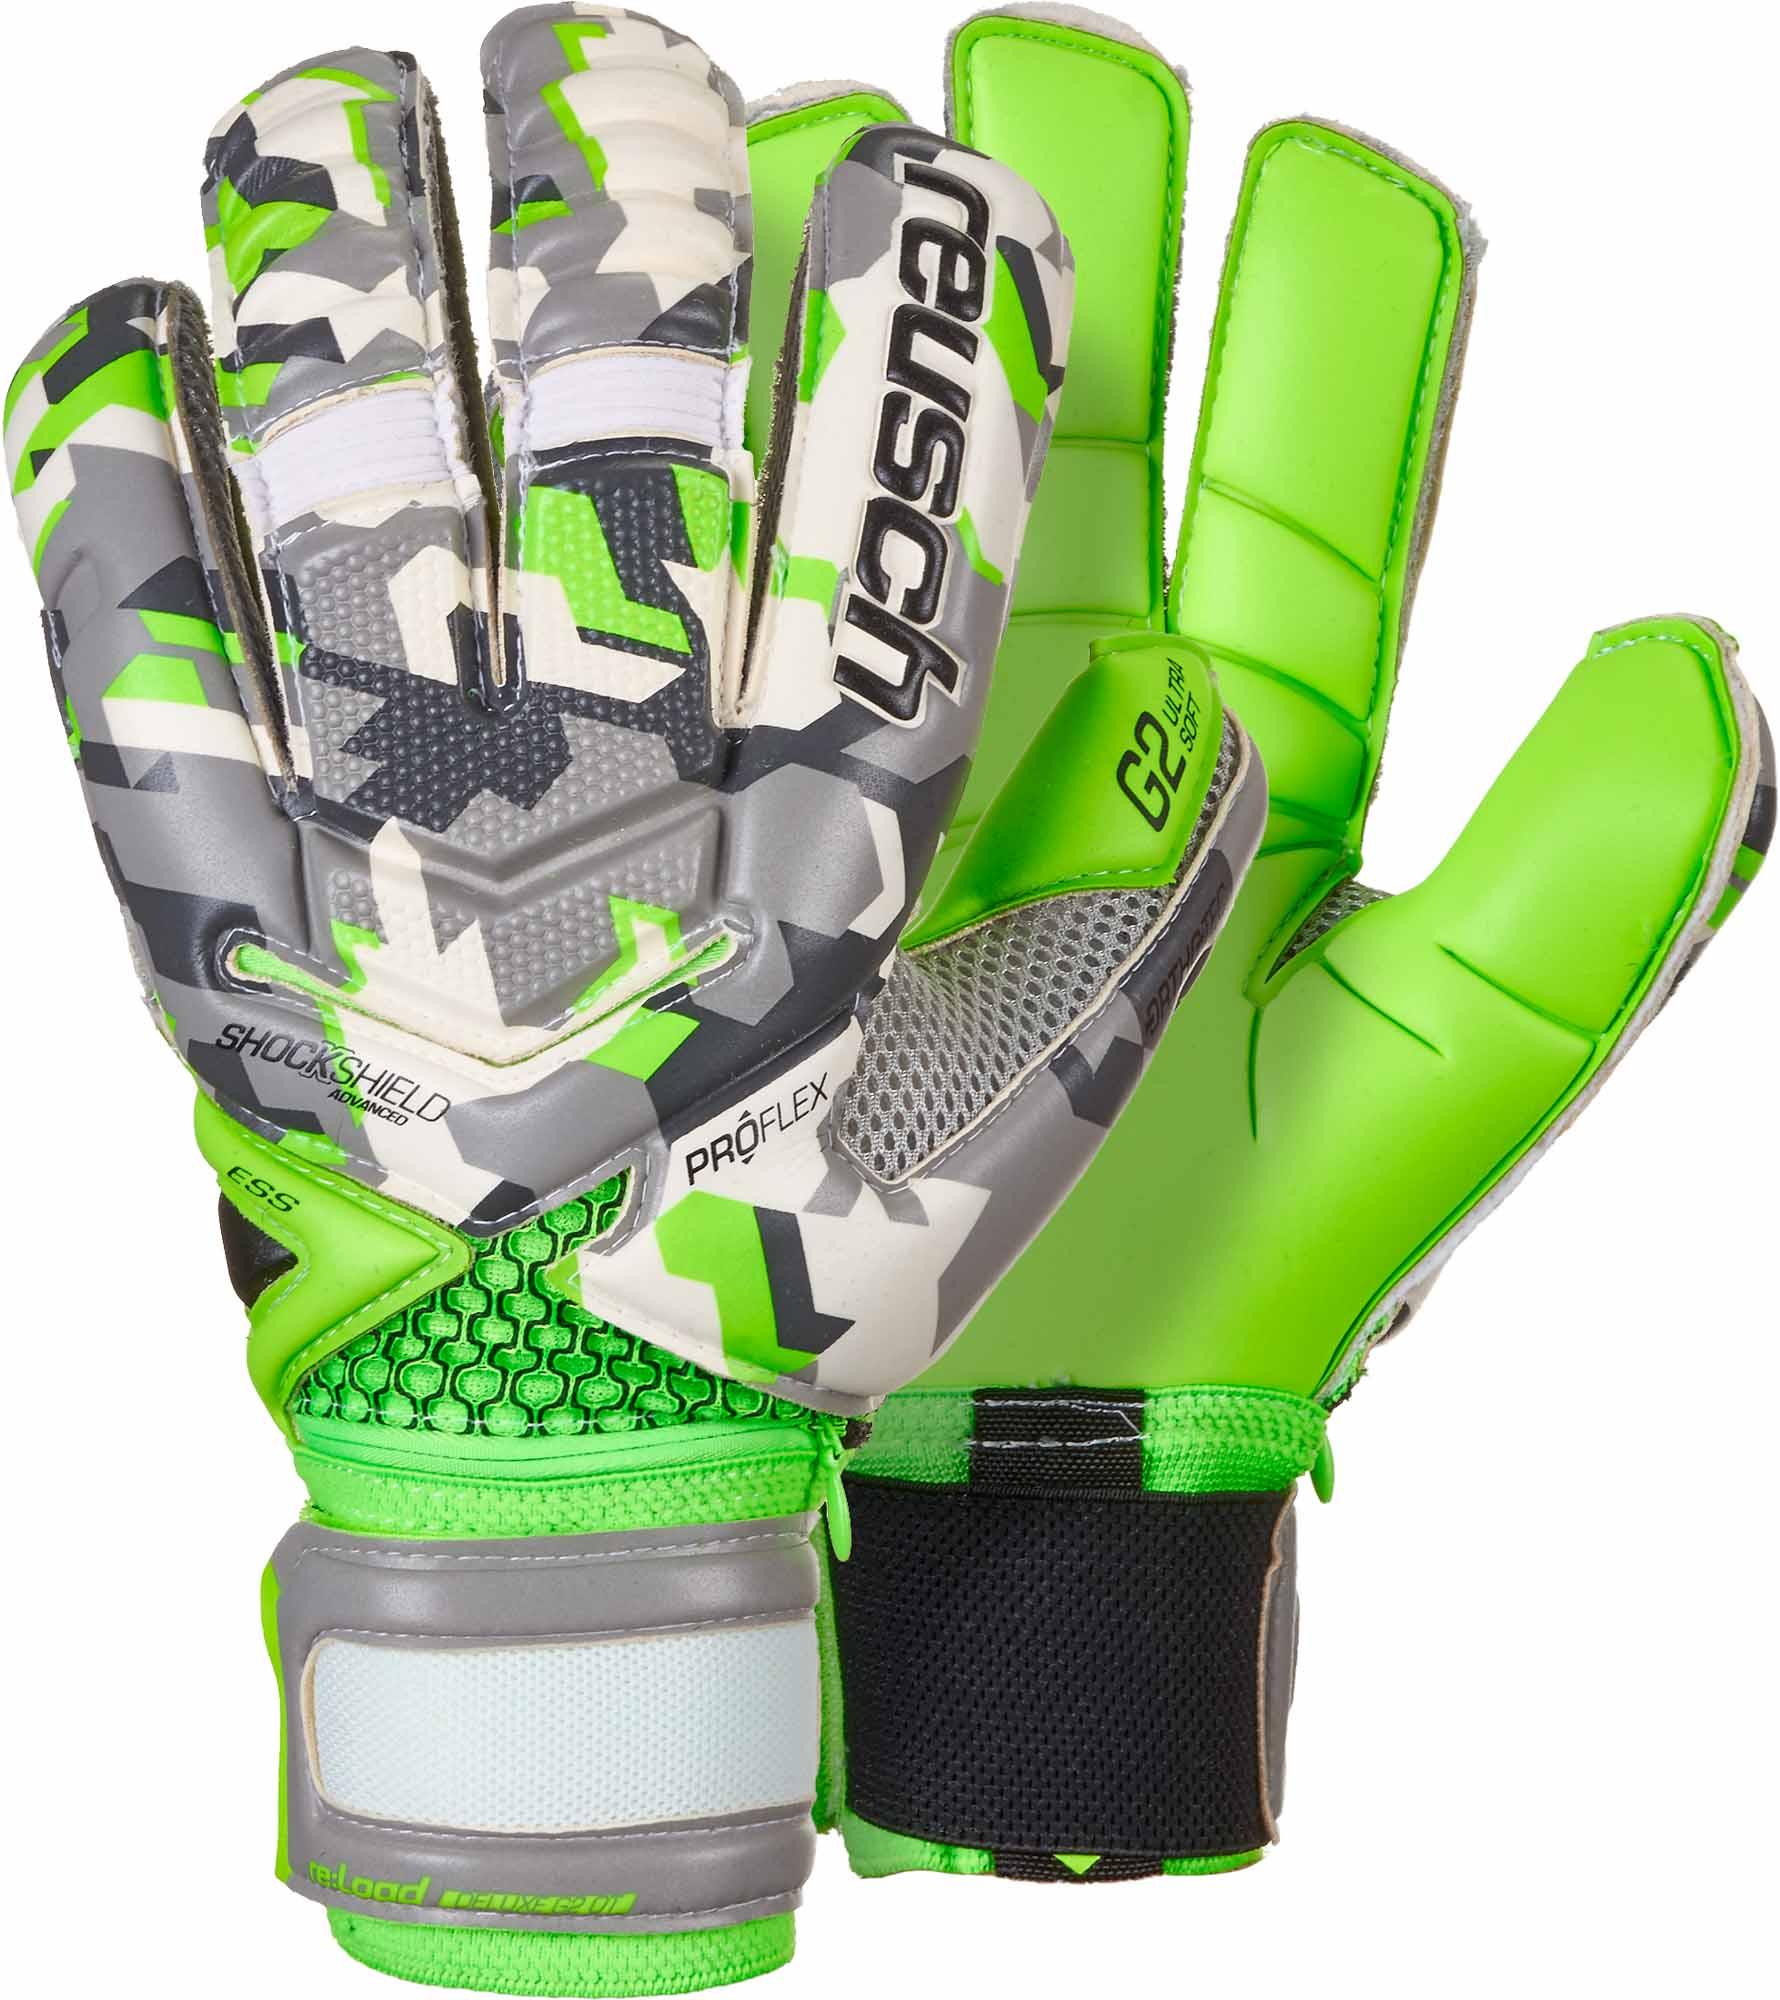 55932156b Reusch Re Load Pro G2 Ortho-Tec Goalkeeper Gloves - Camo - Soccer Master